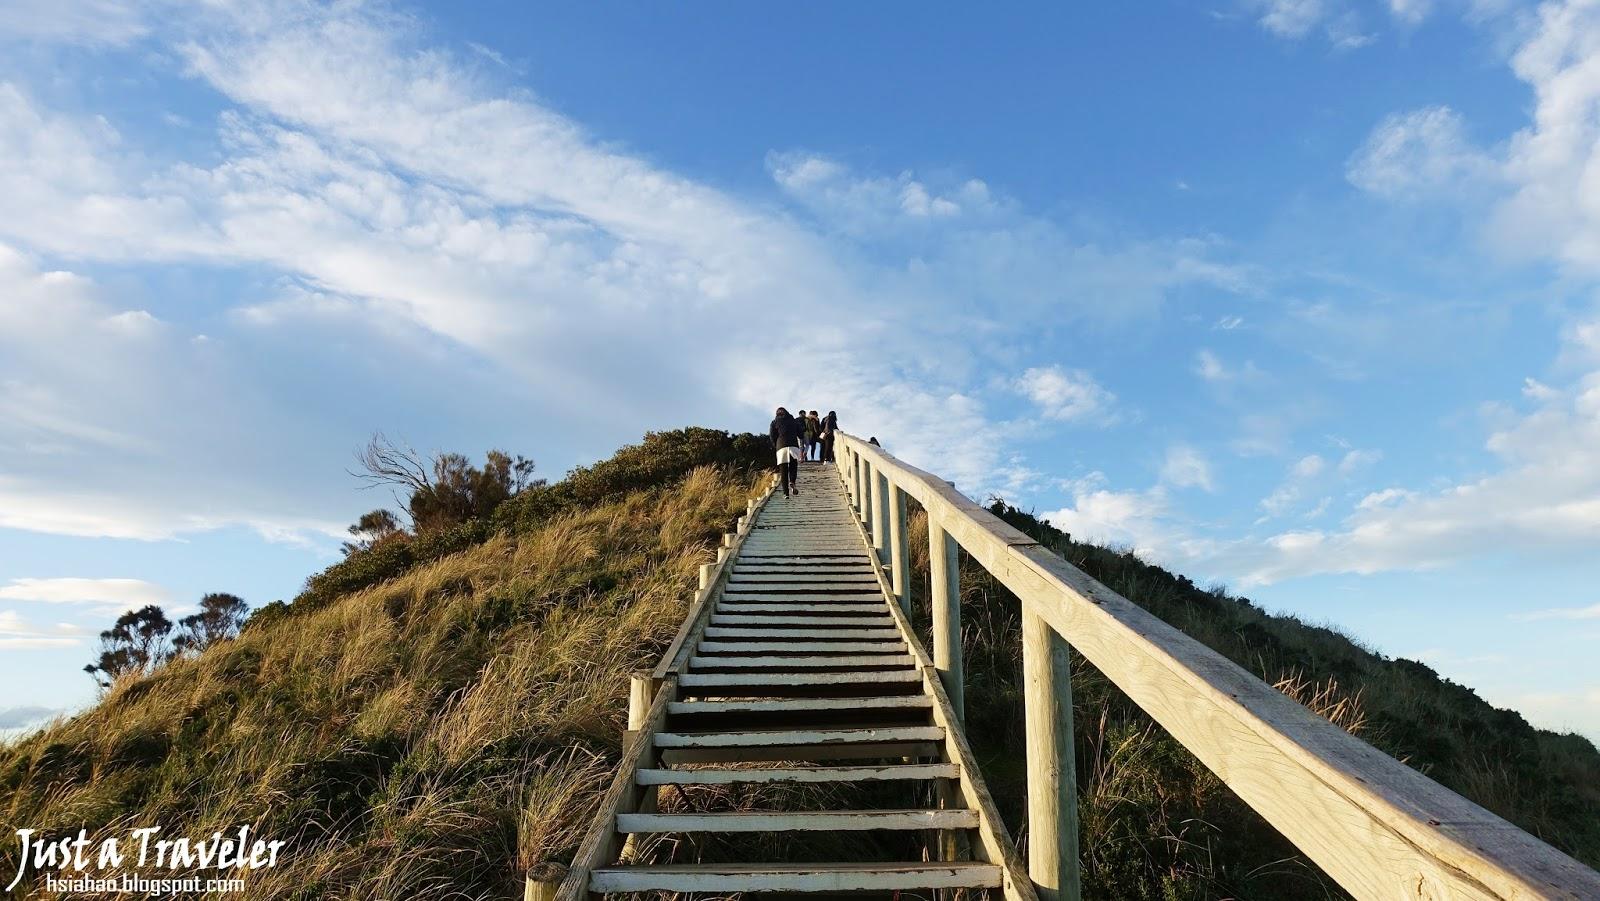 塔斯馬尼亞-景點-推薦-布魯尼島-Bruny-Island-澳洲-Tasmania-Tourist-Attraction-Australia